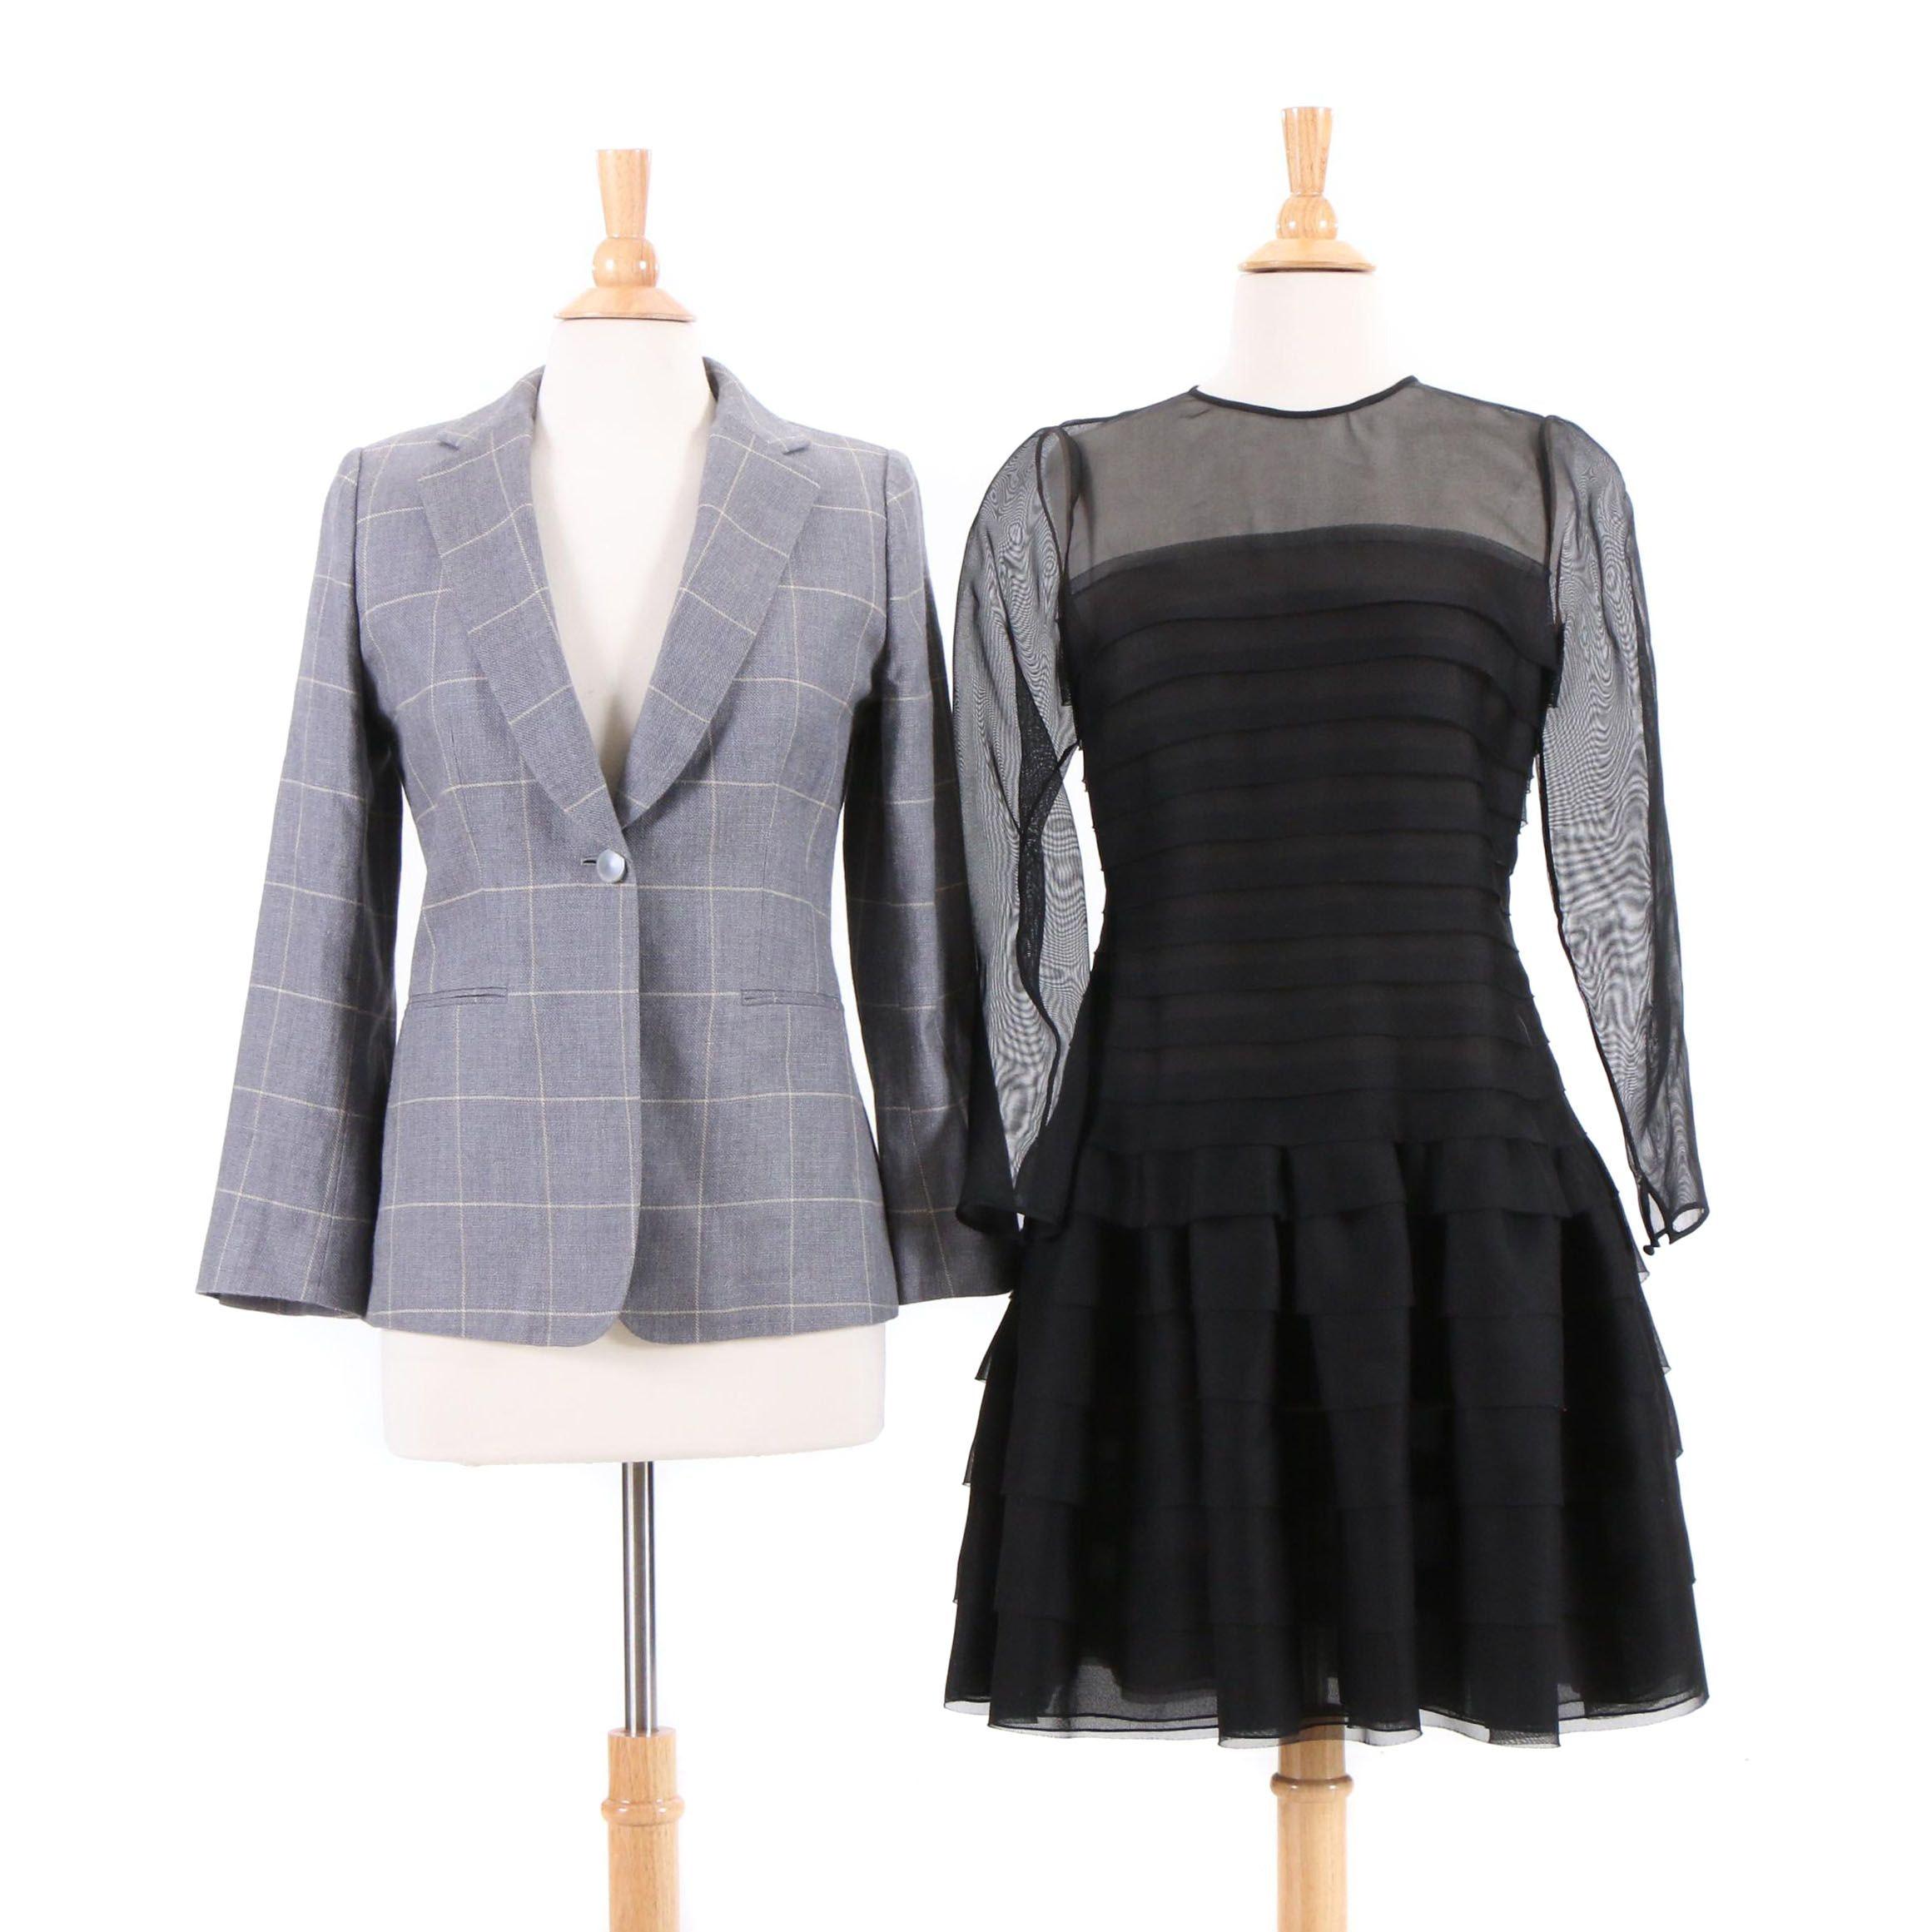 Oscar de la Renta Tiered Silk Dress and Giorgio Armani Cashmere Blend Blazer